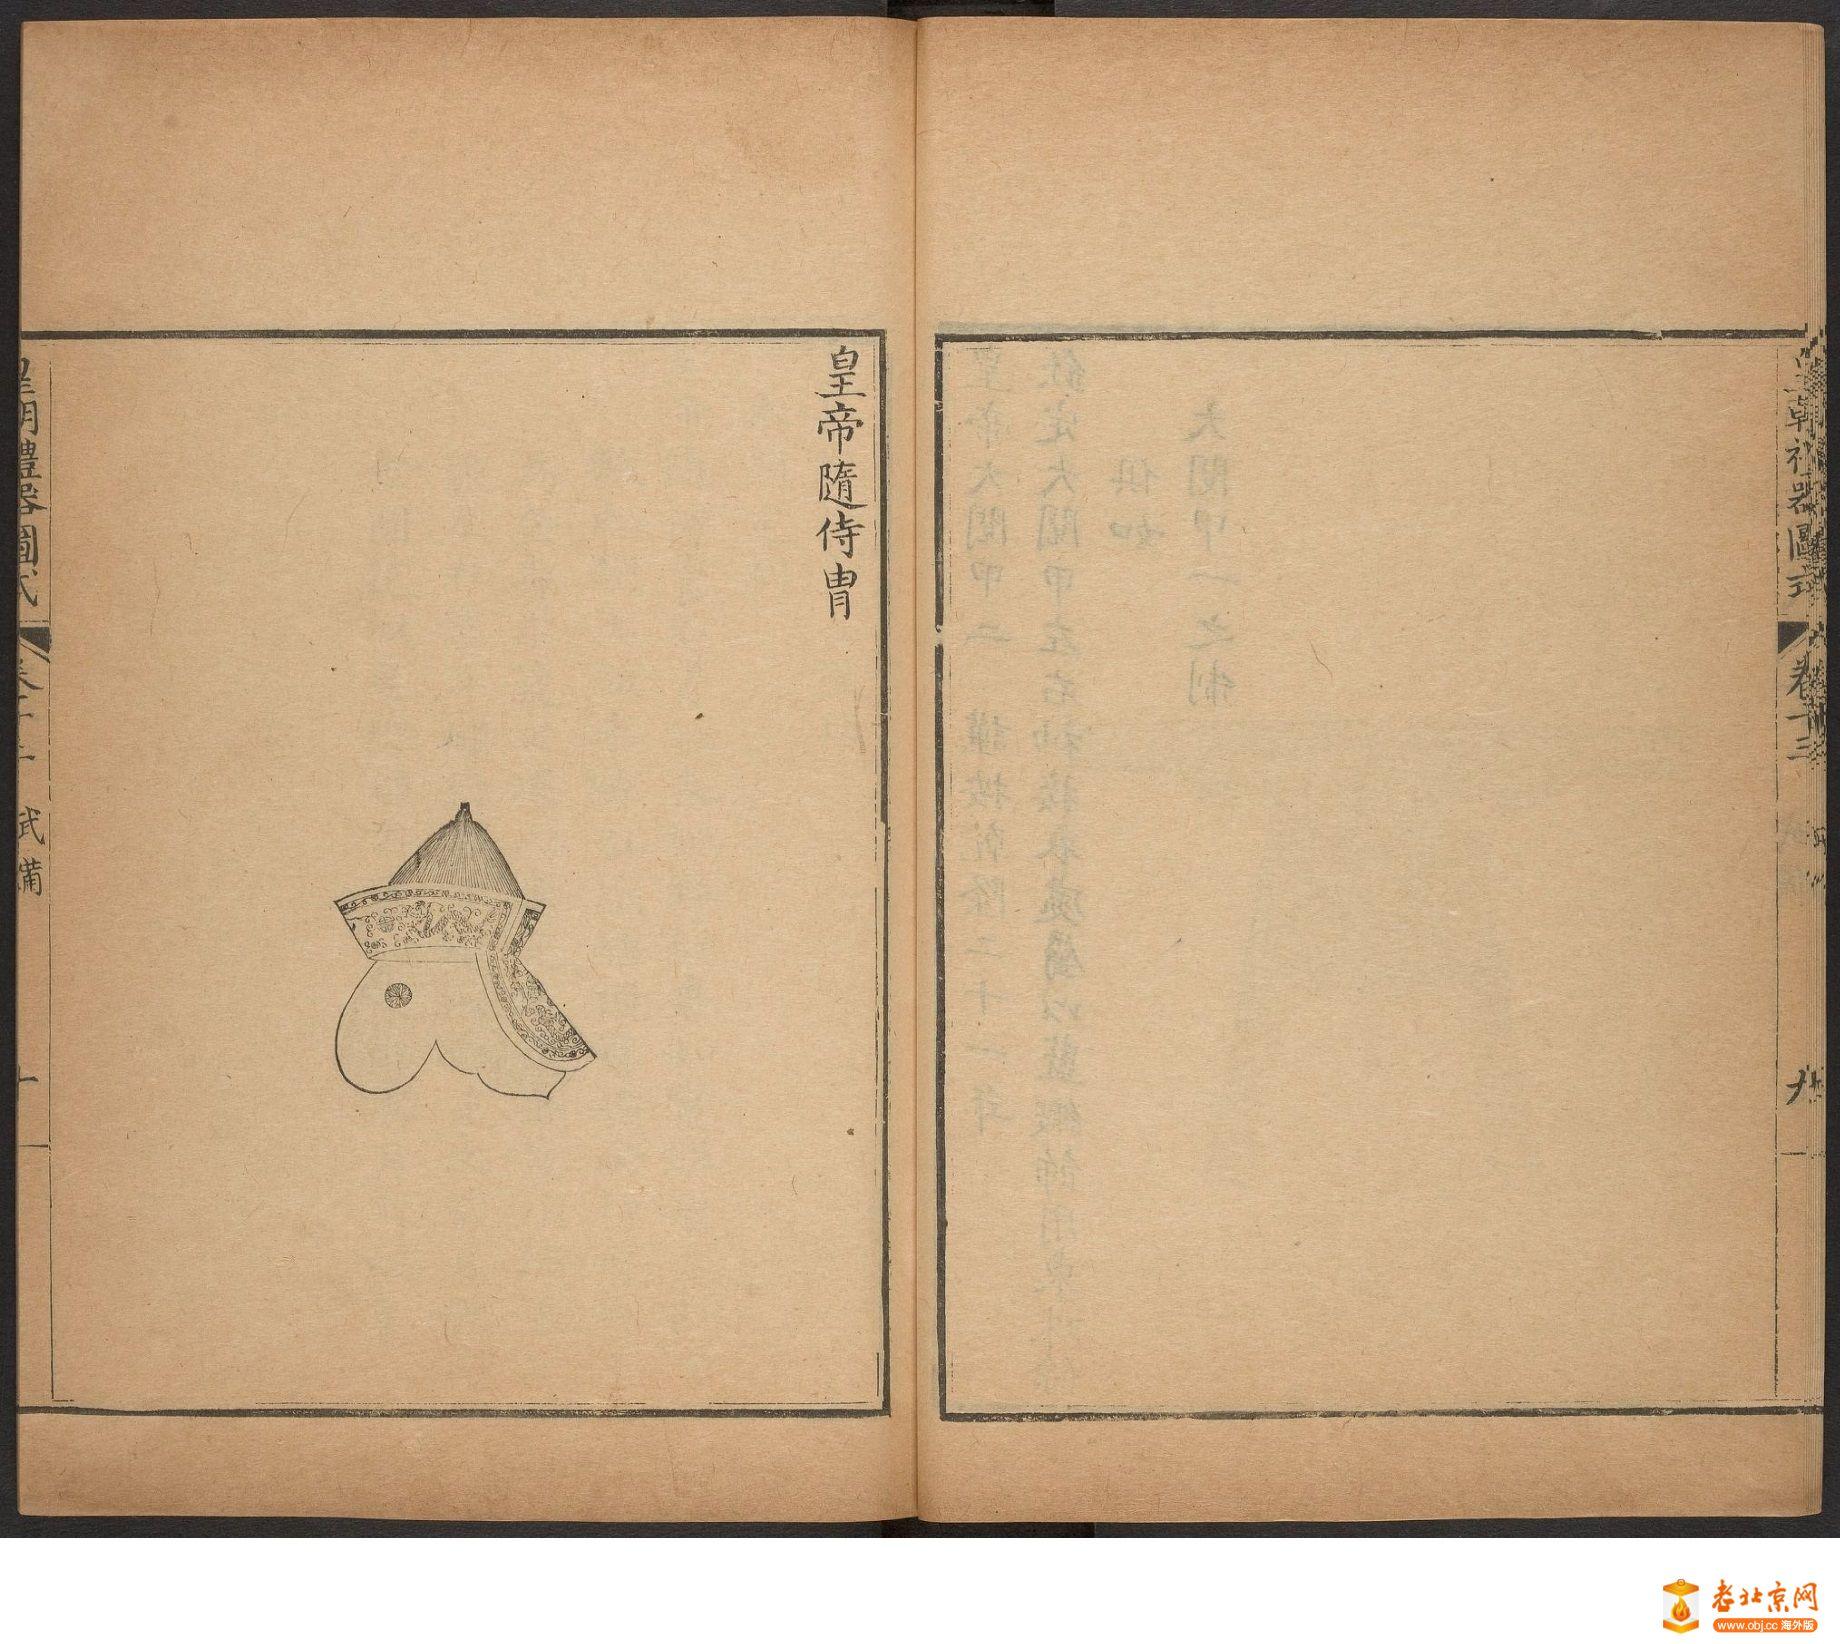 1_page10_image1 - 複製.jpg